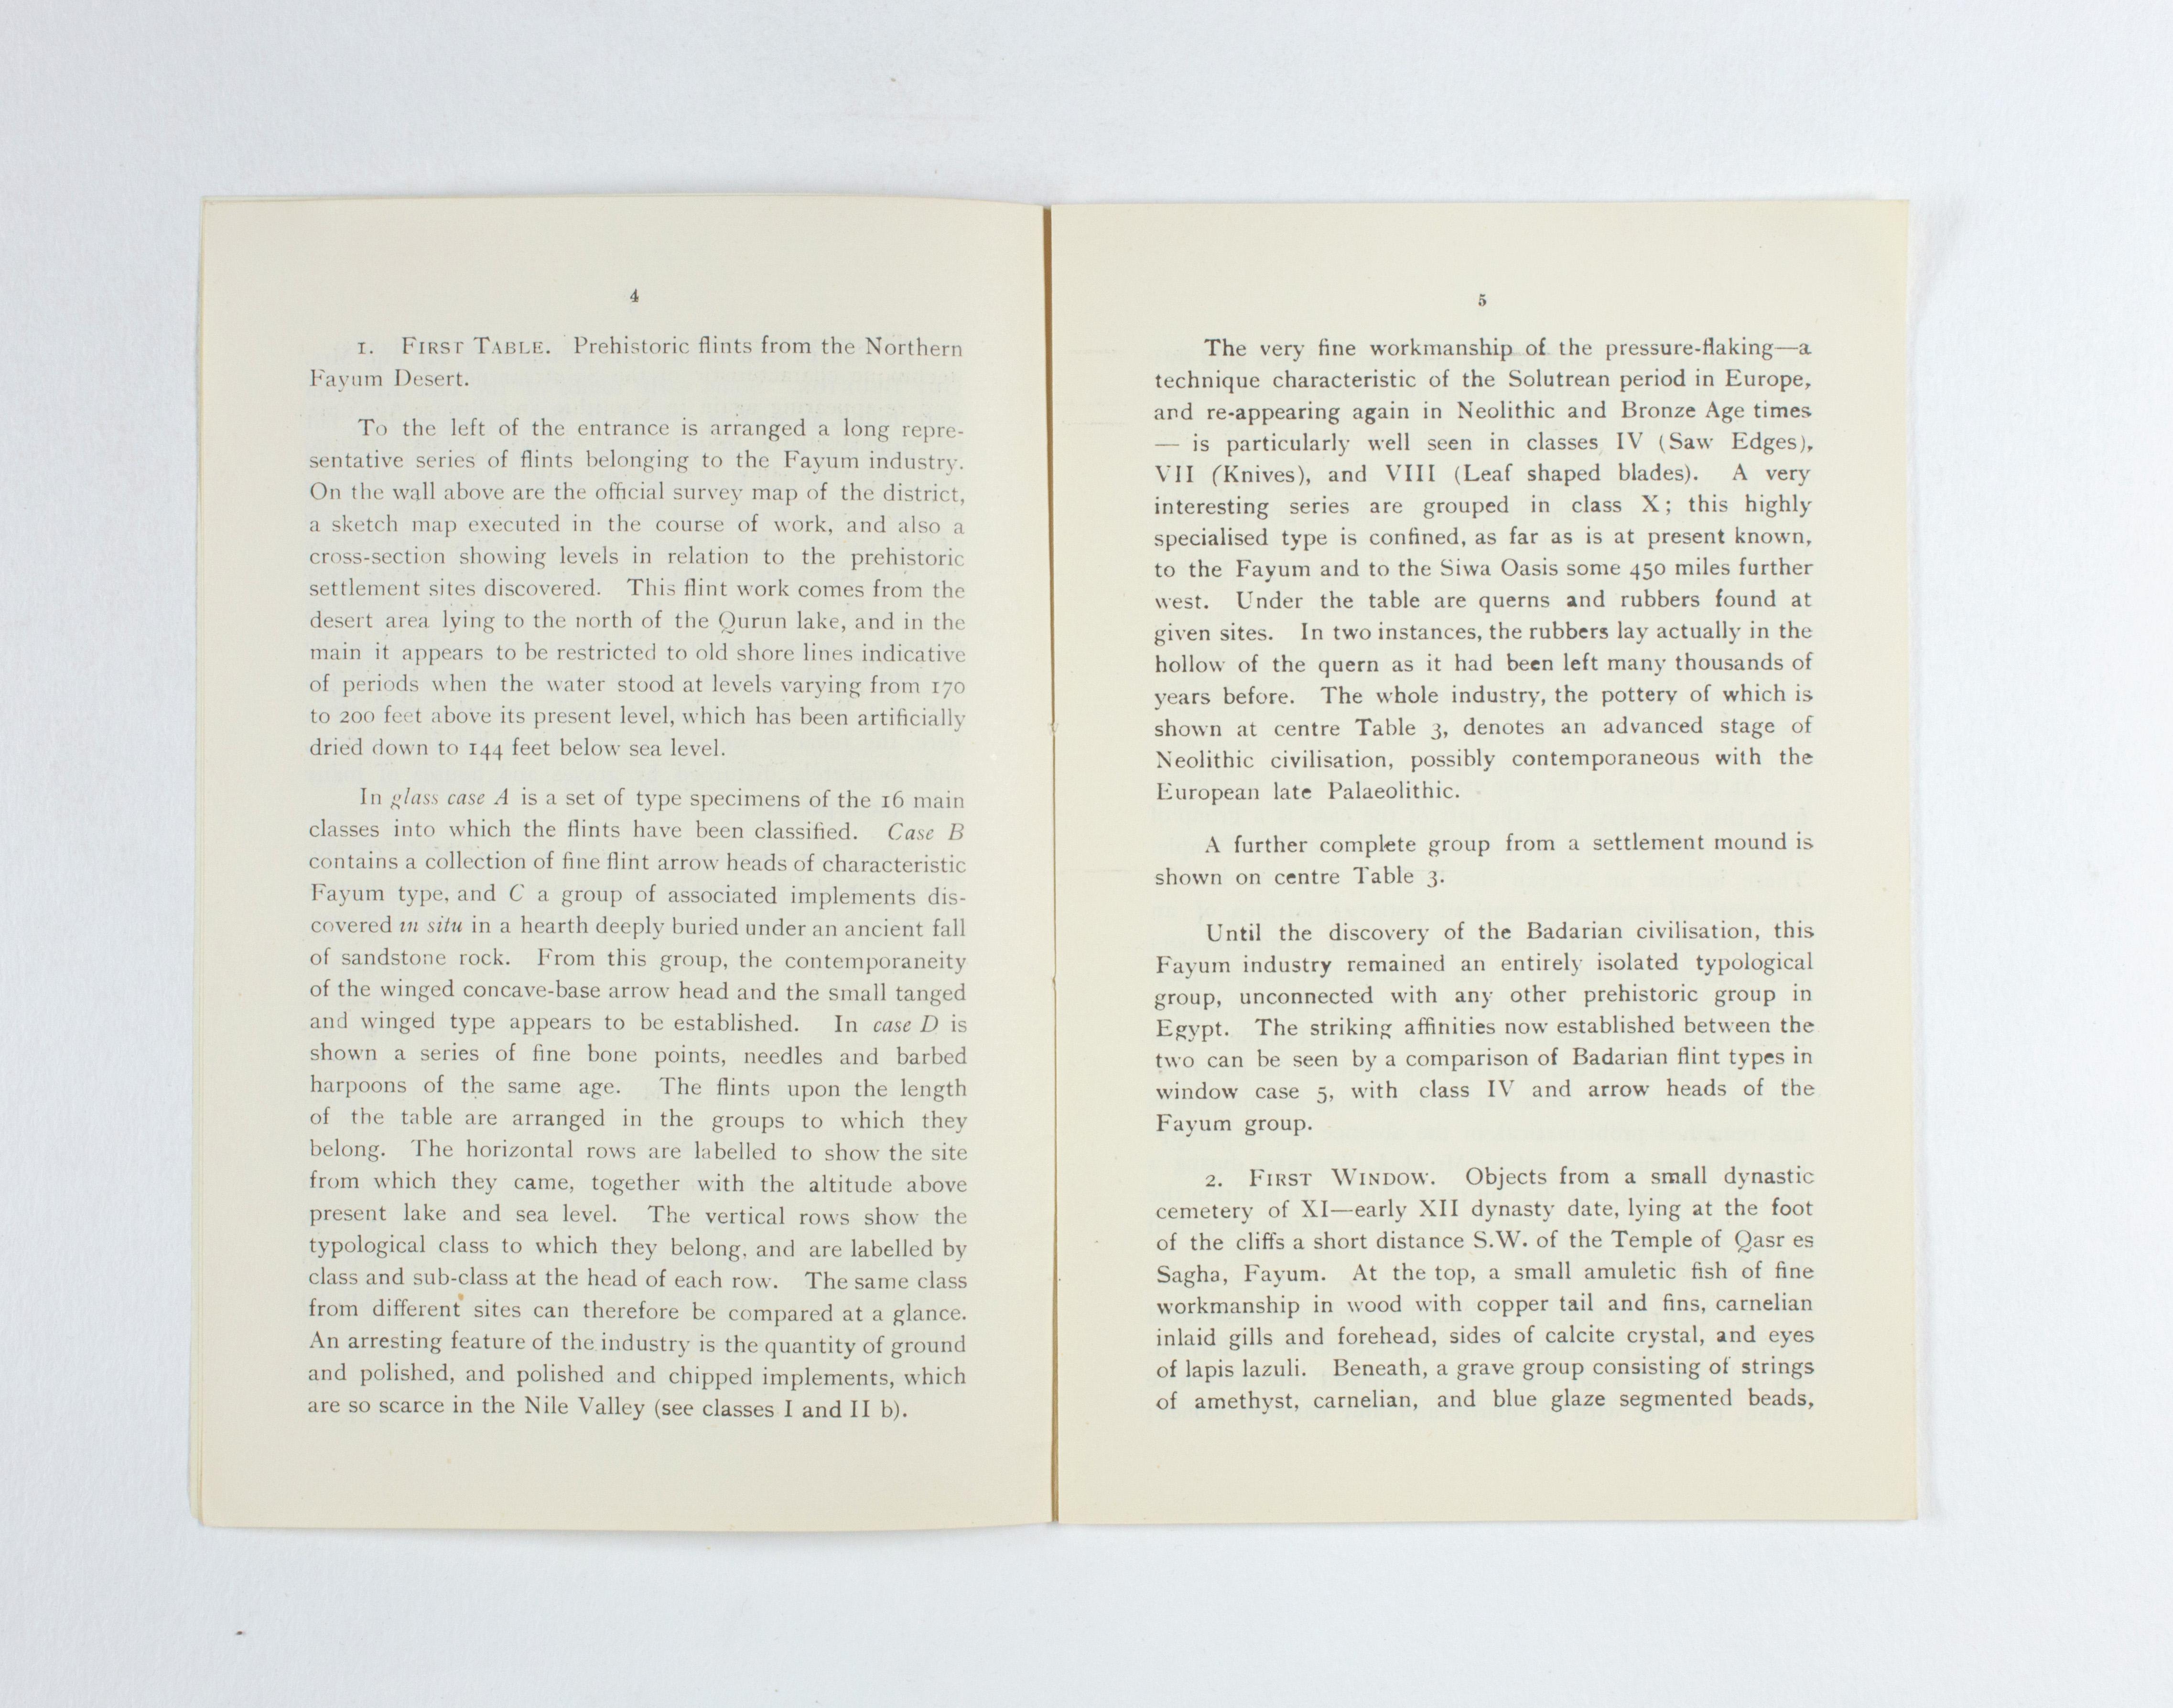 1924-25 Badari, Faiyum Exhibition catalogue PMA/WFP1/D/28/30.5